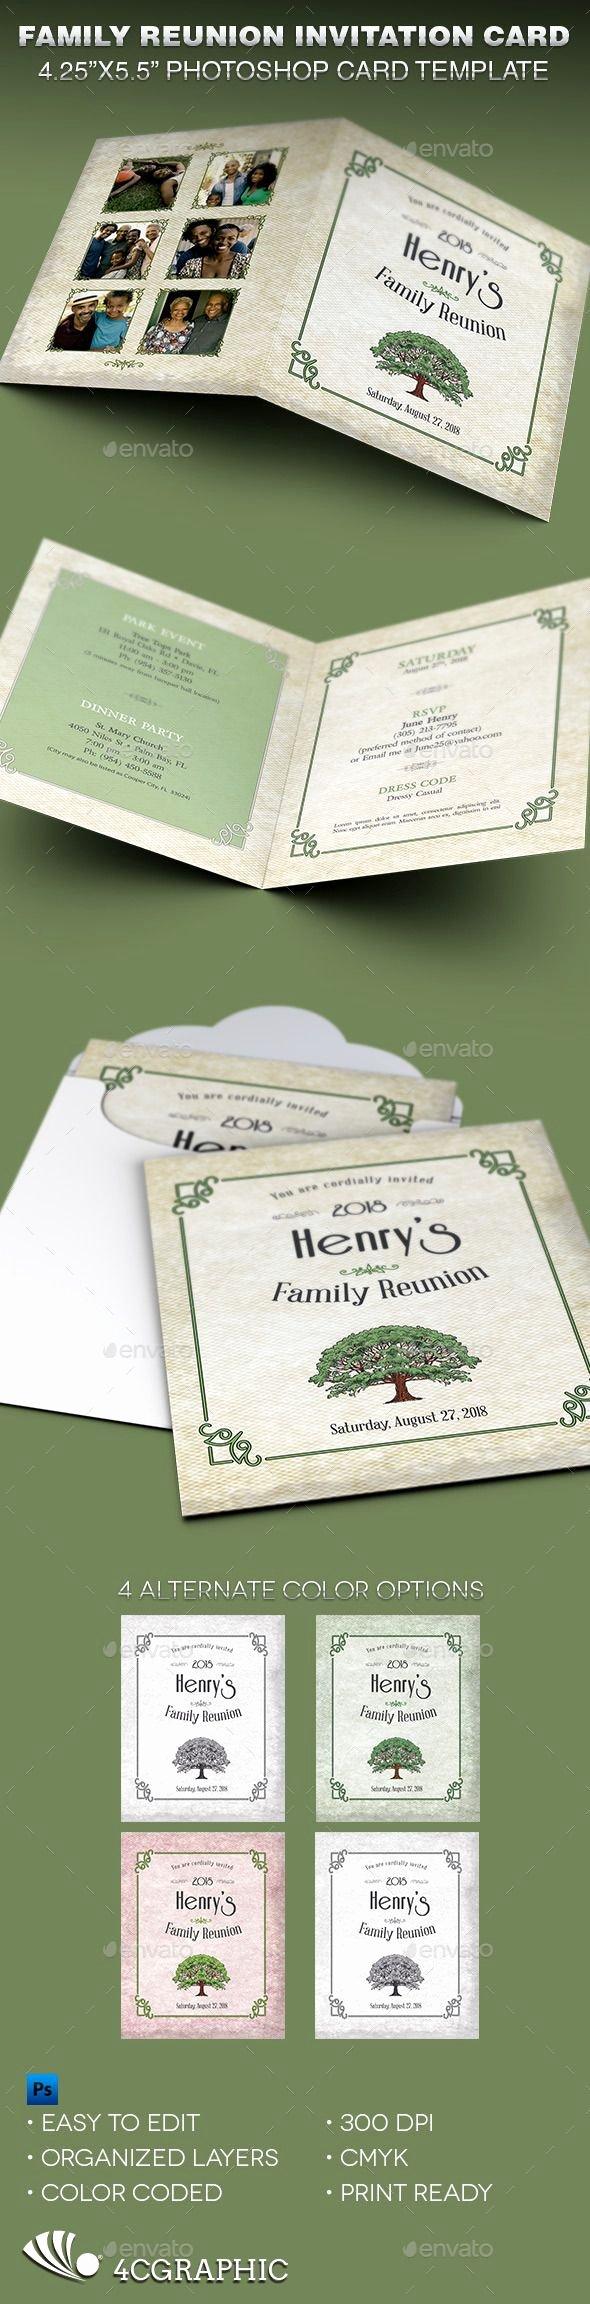 Family Reunion Invitation Templates Free Best Of 17 Best Ideas About Family Reunion Invitations On